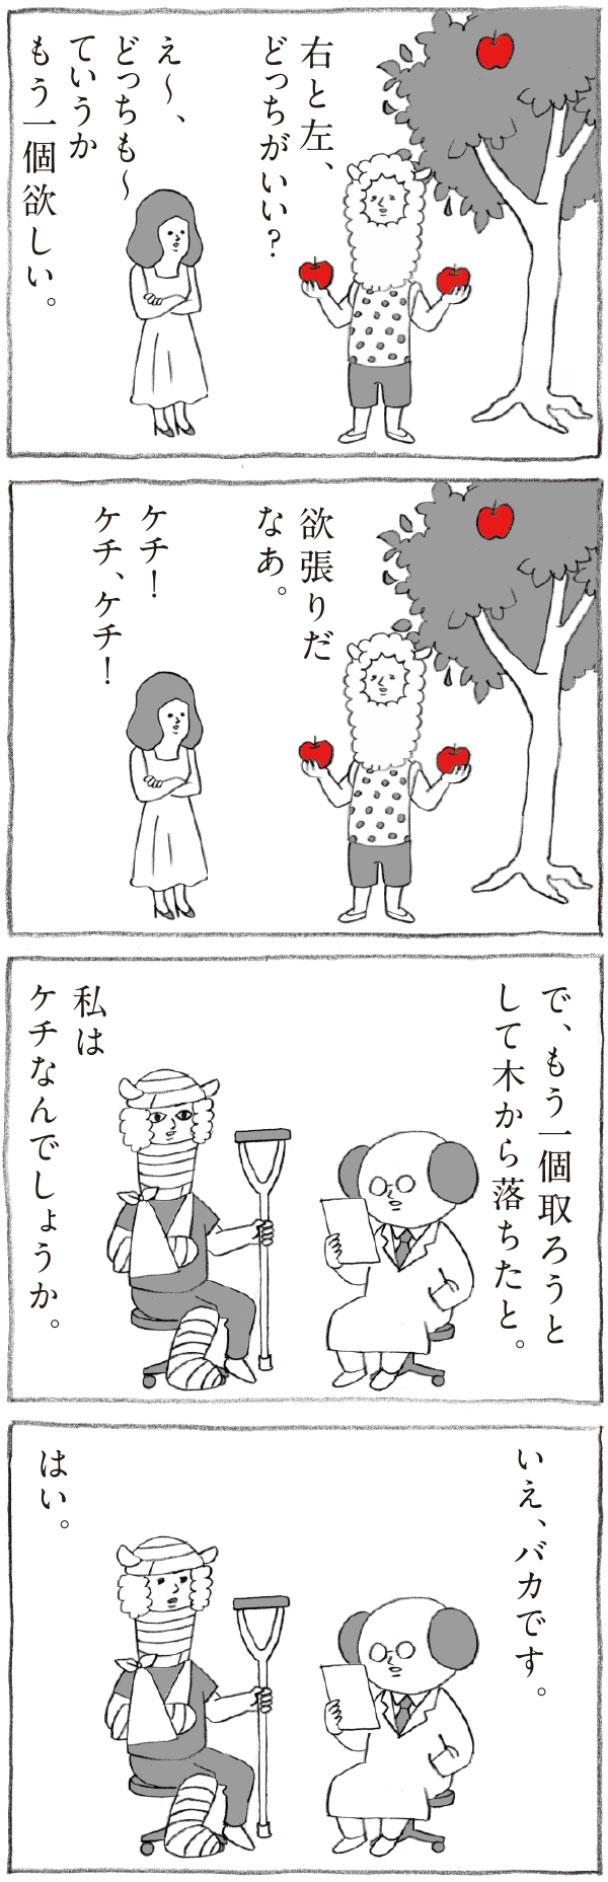 Hanako 1174号:おかわり自由